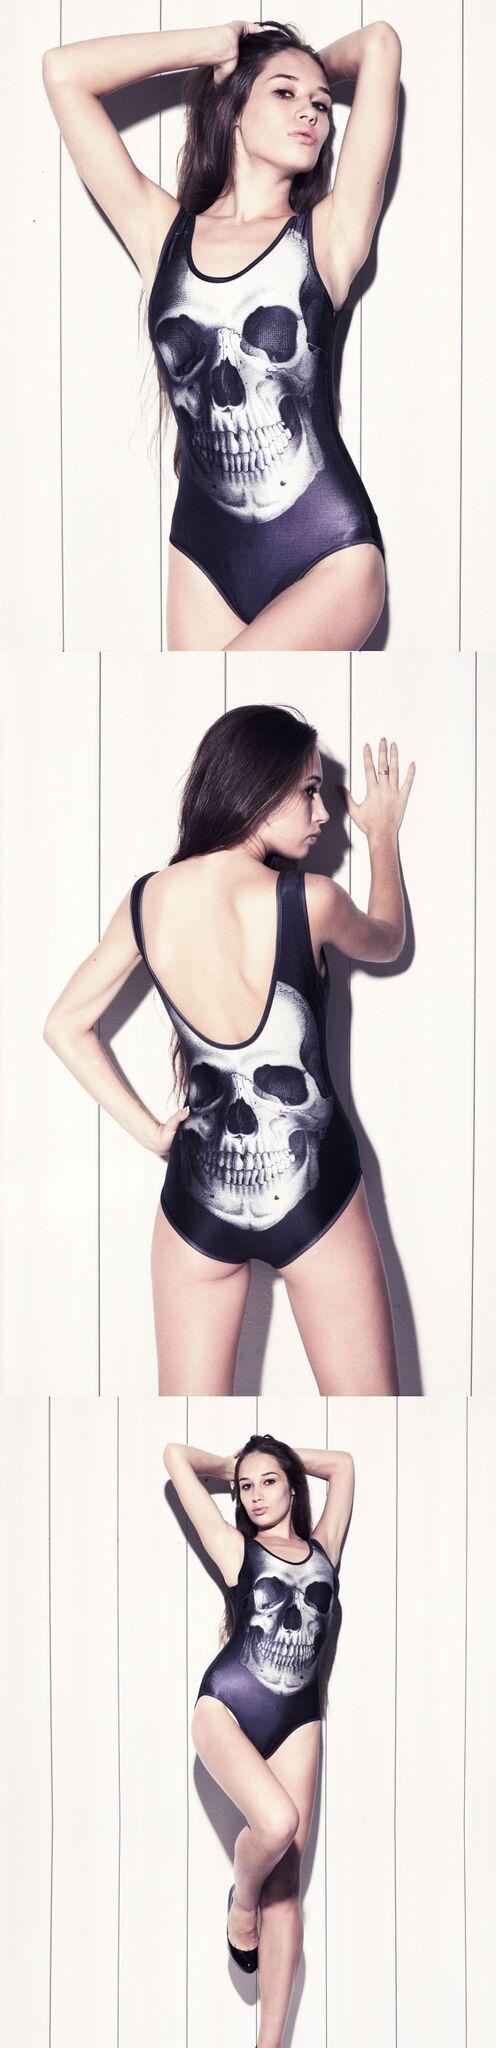 Shop some badass skull swimwear - from bikinis, sharkinis, monokinis, full body suit just to name a few.